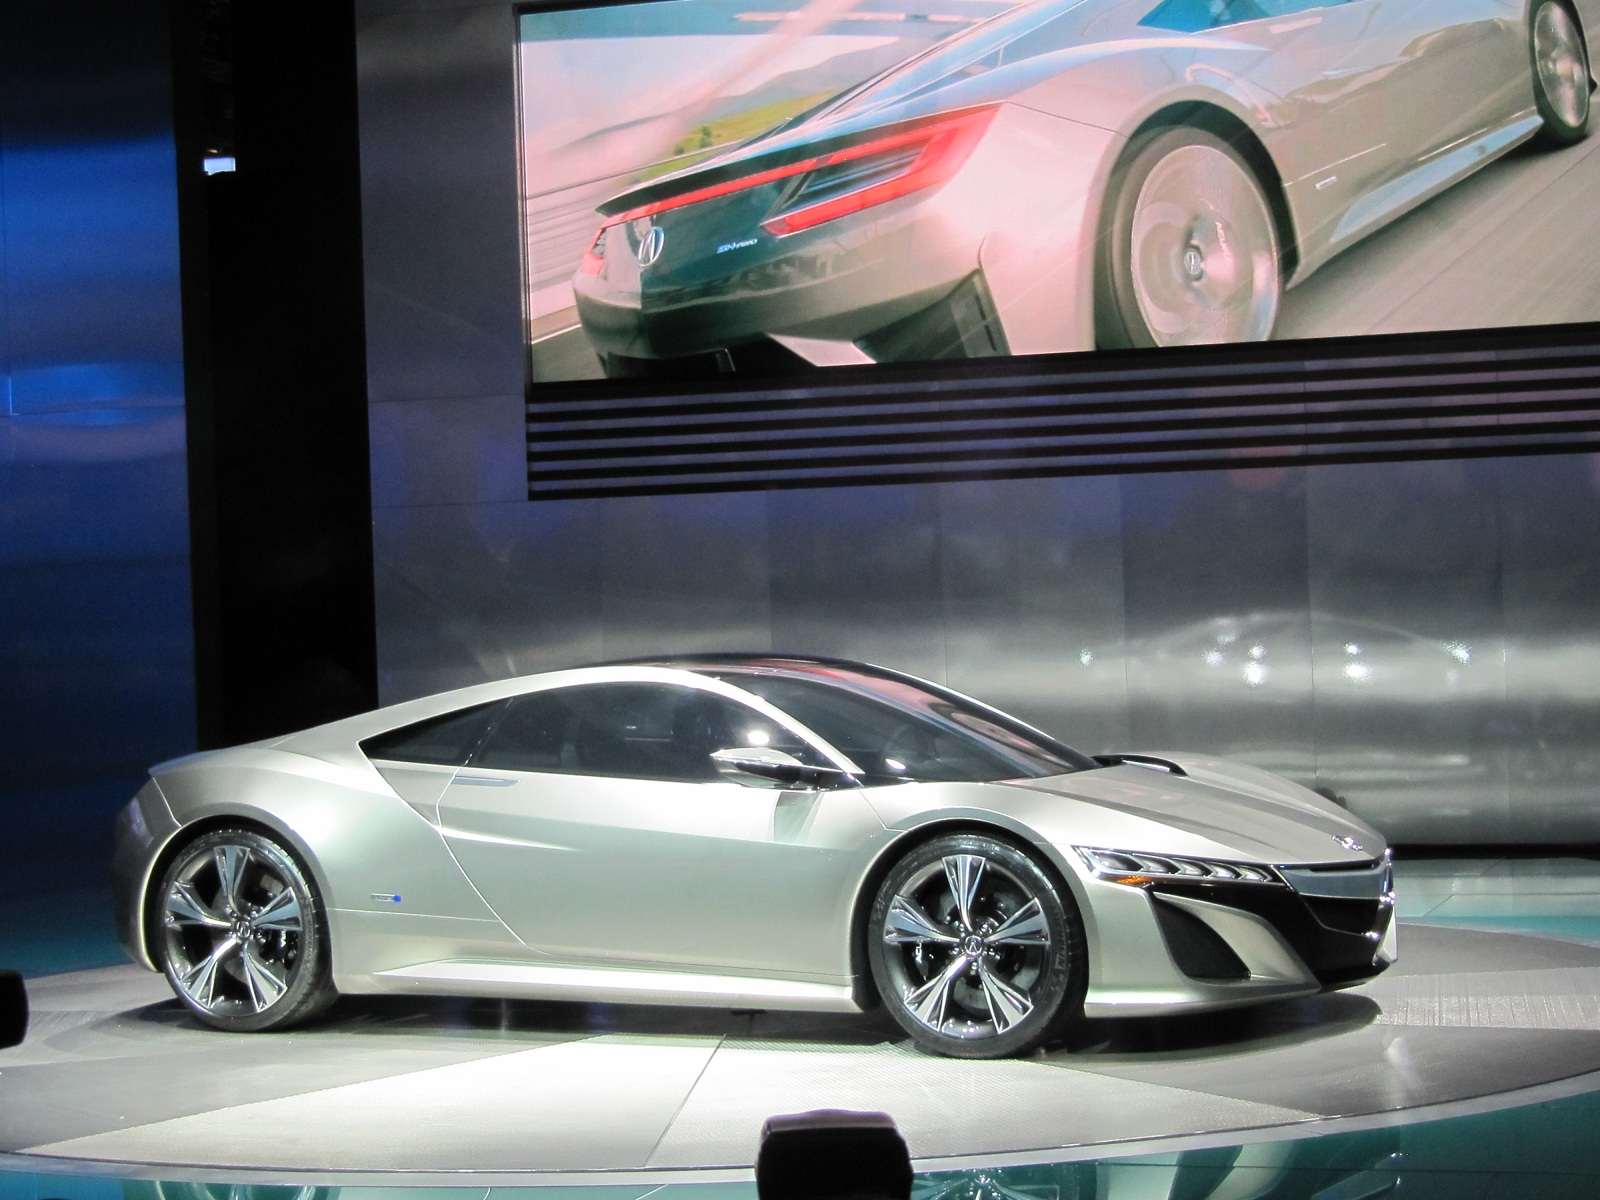 Acura NSX Concept: All-Wheel Drive Hybrid Supercar For 2015